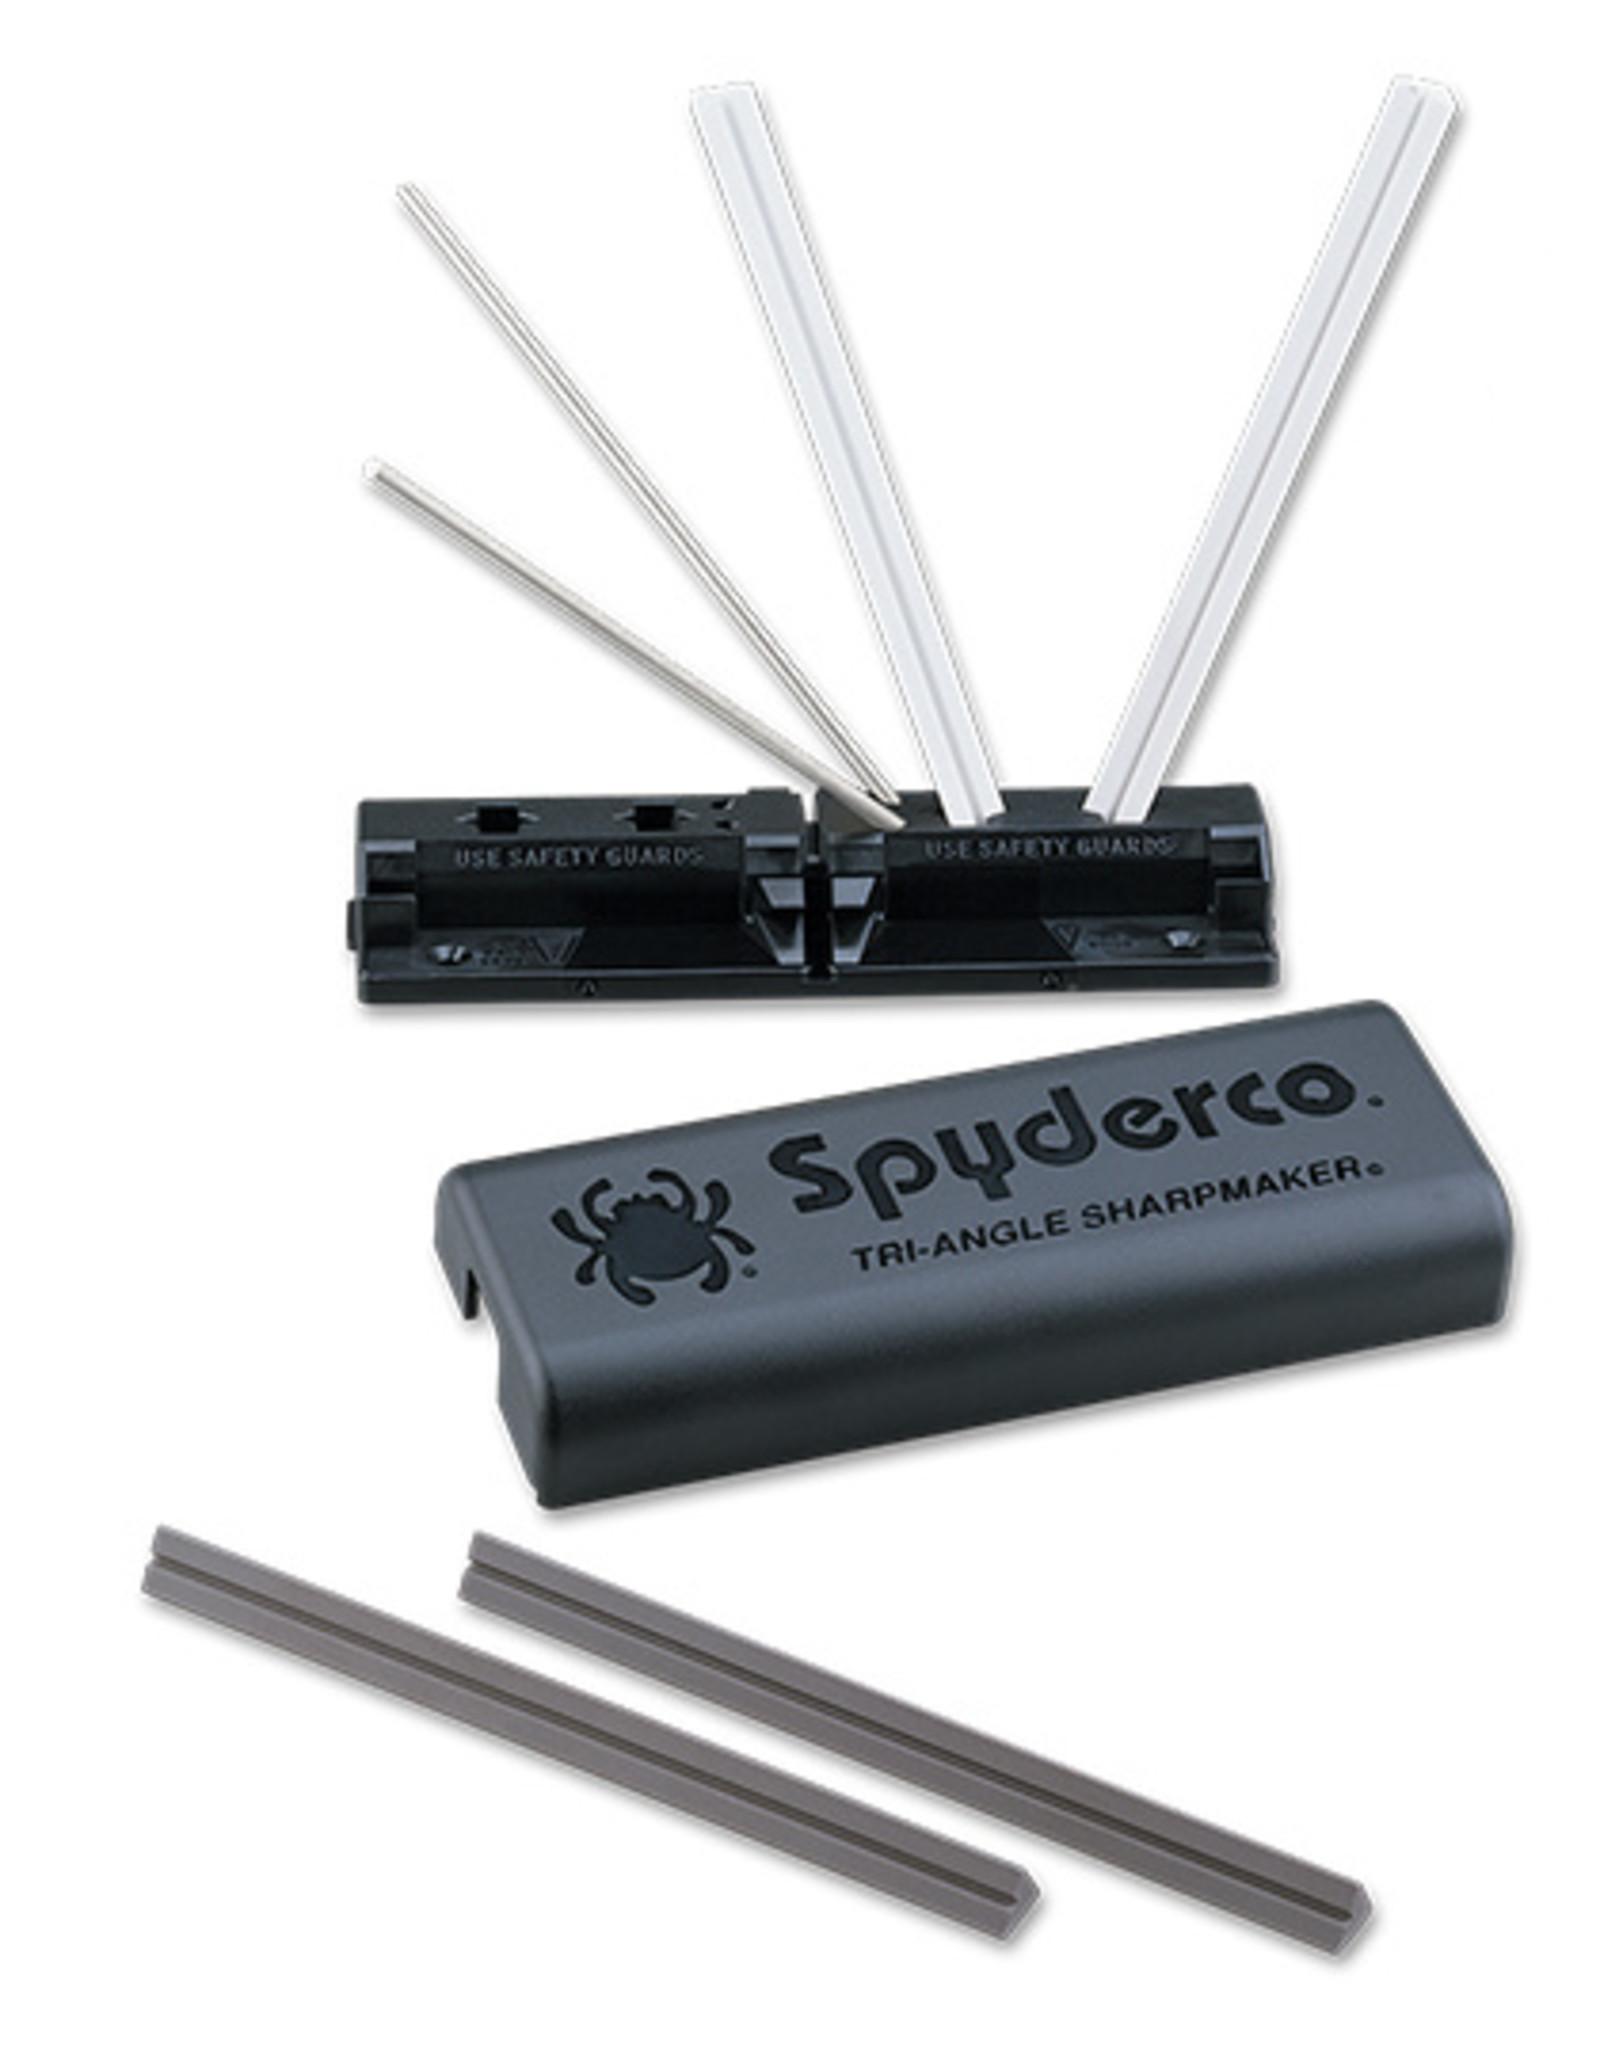 SPYDERCO Spyderco - Tri-angle Sharpmaker